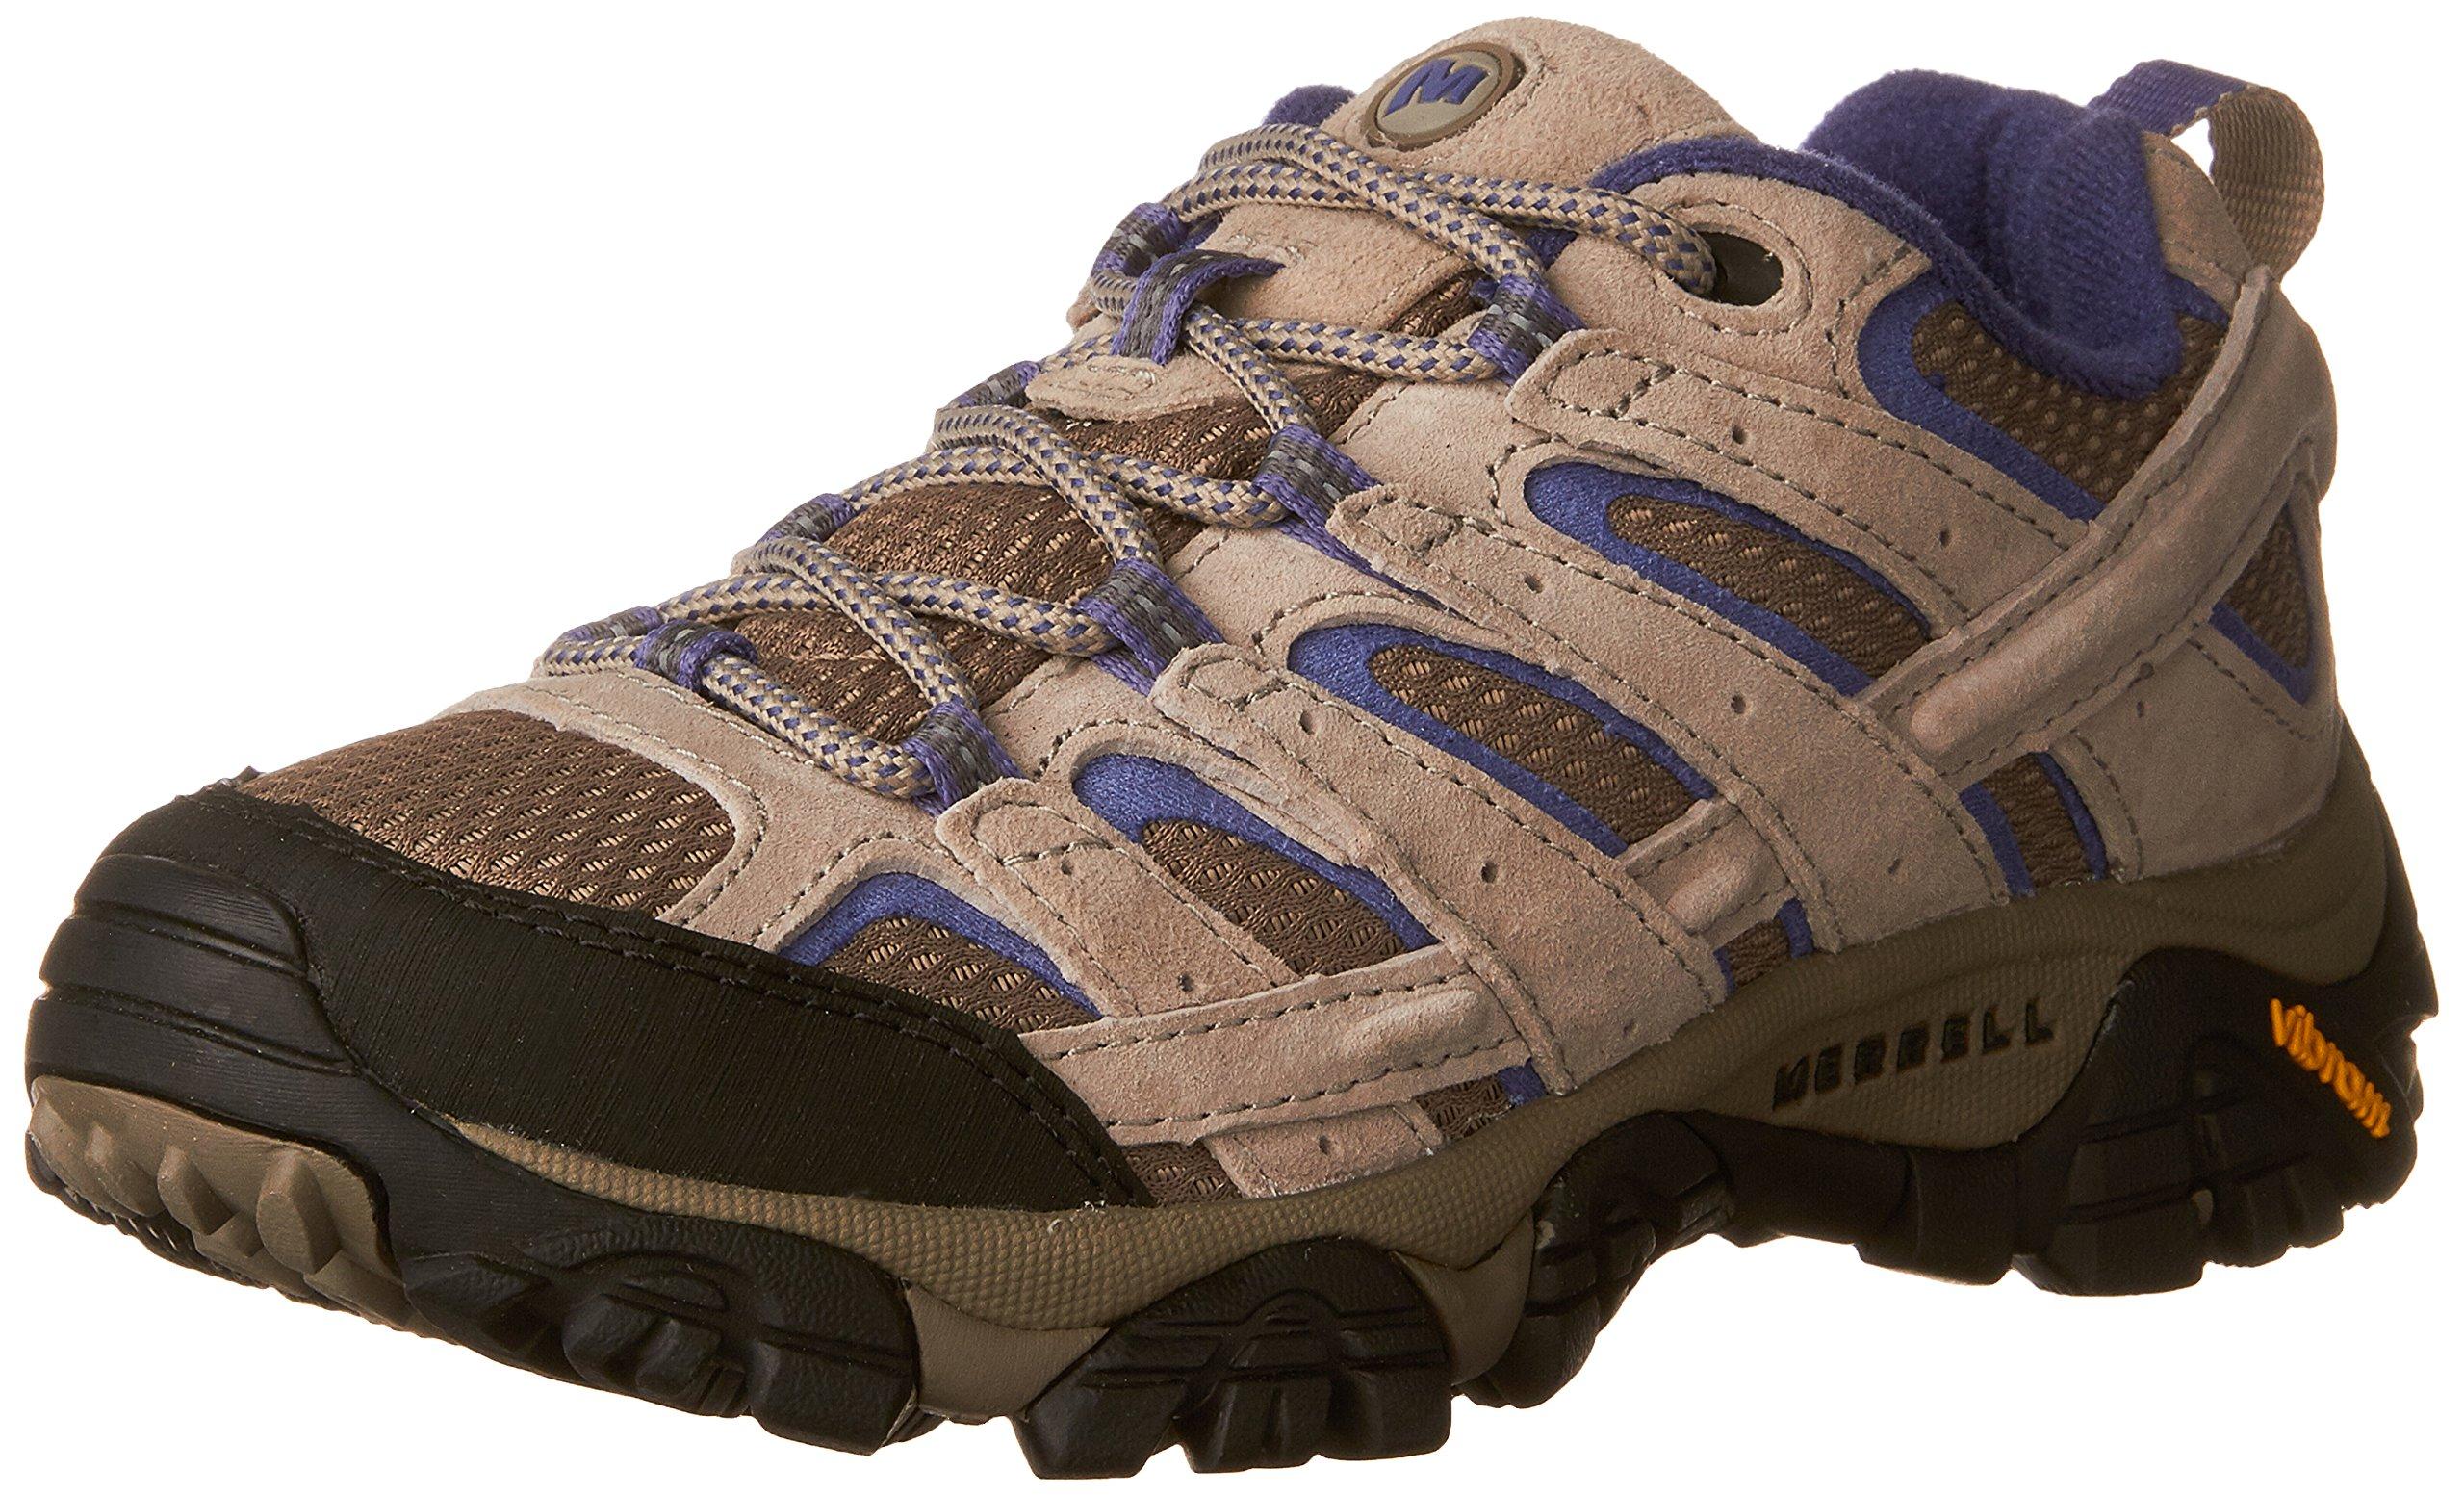 Merrell Women's Moab 2 Vent Hiking Shoe, Aluminum/Marlin, 8 M US